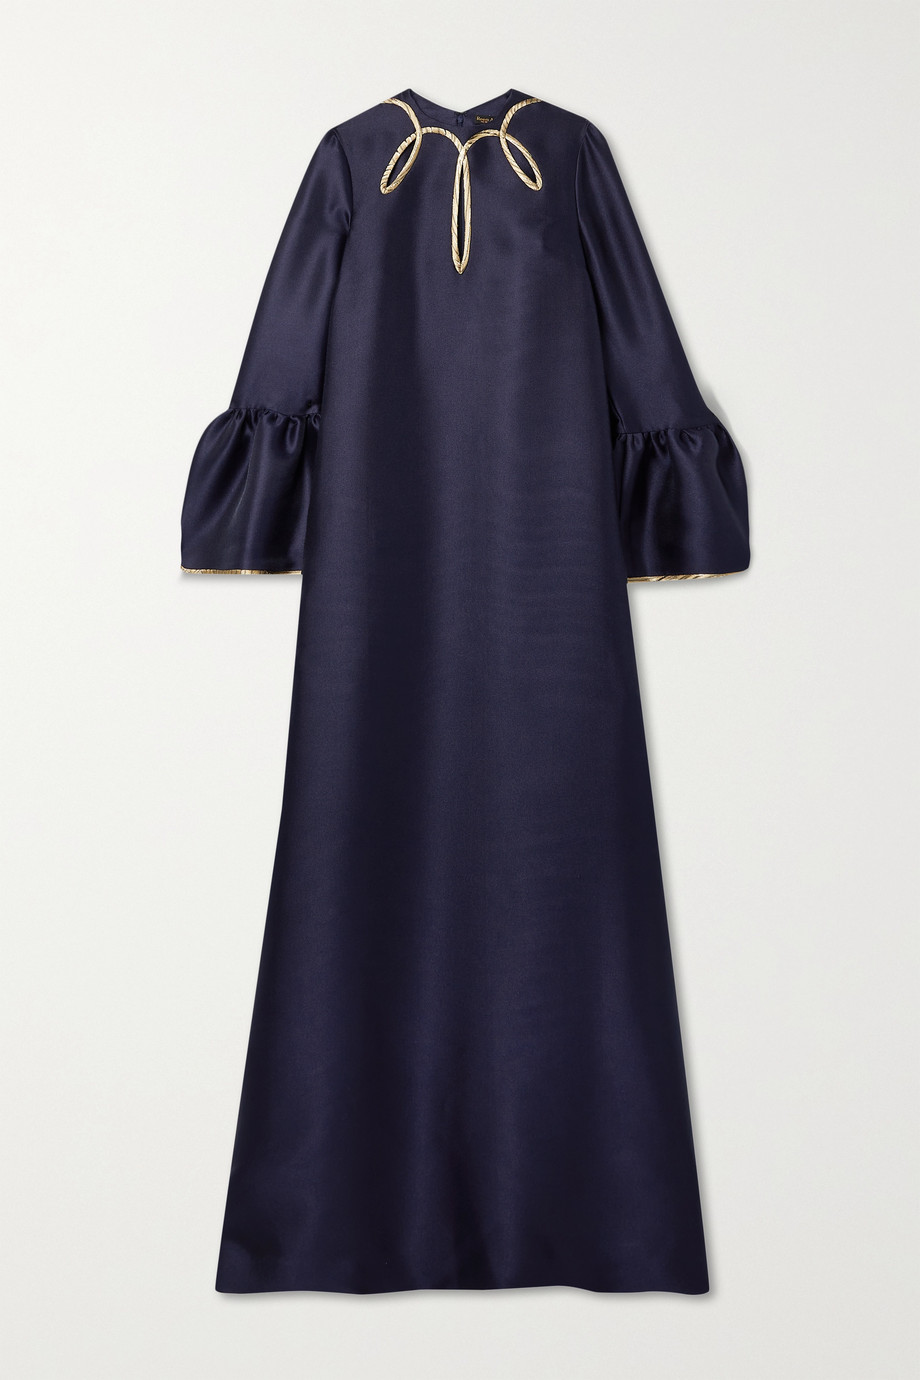 Reem Acra Cutout metallic-trimmed satin-piqué gown